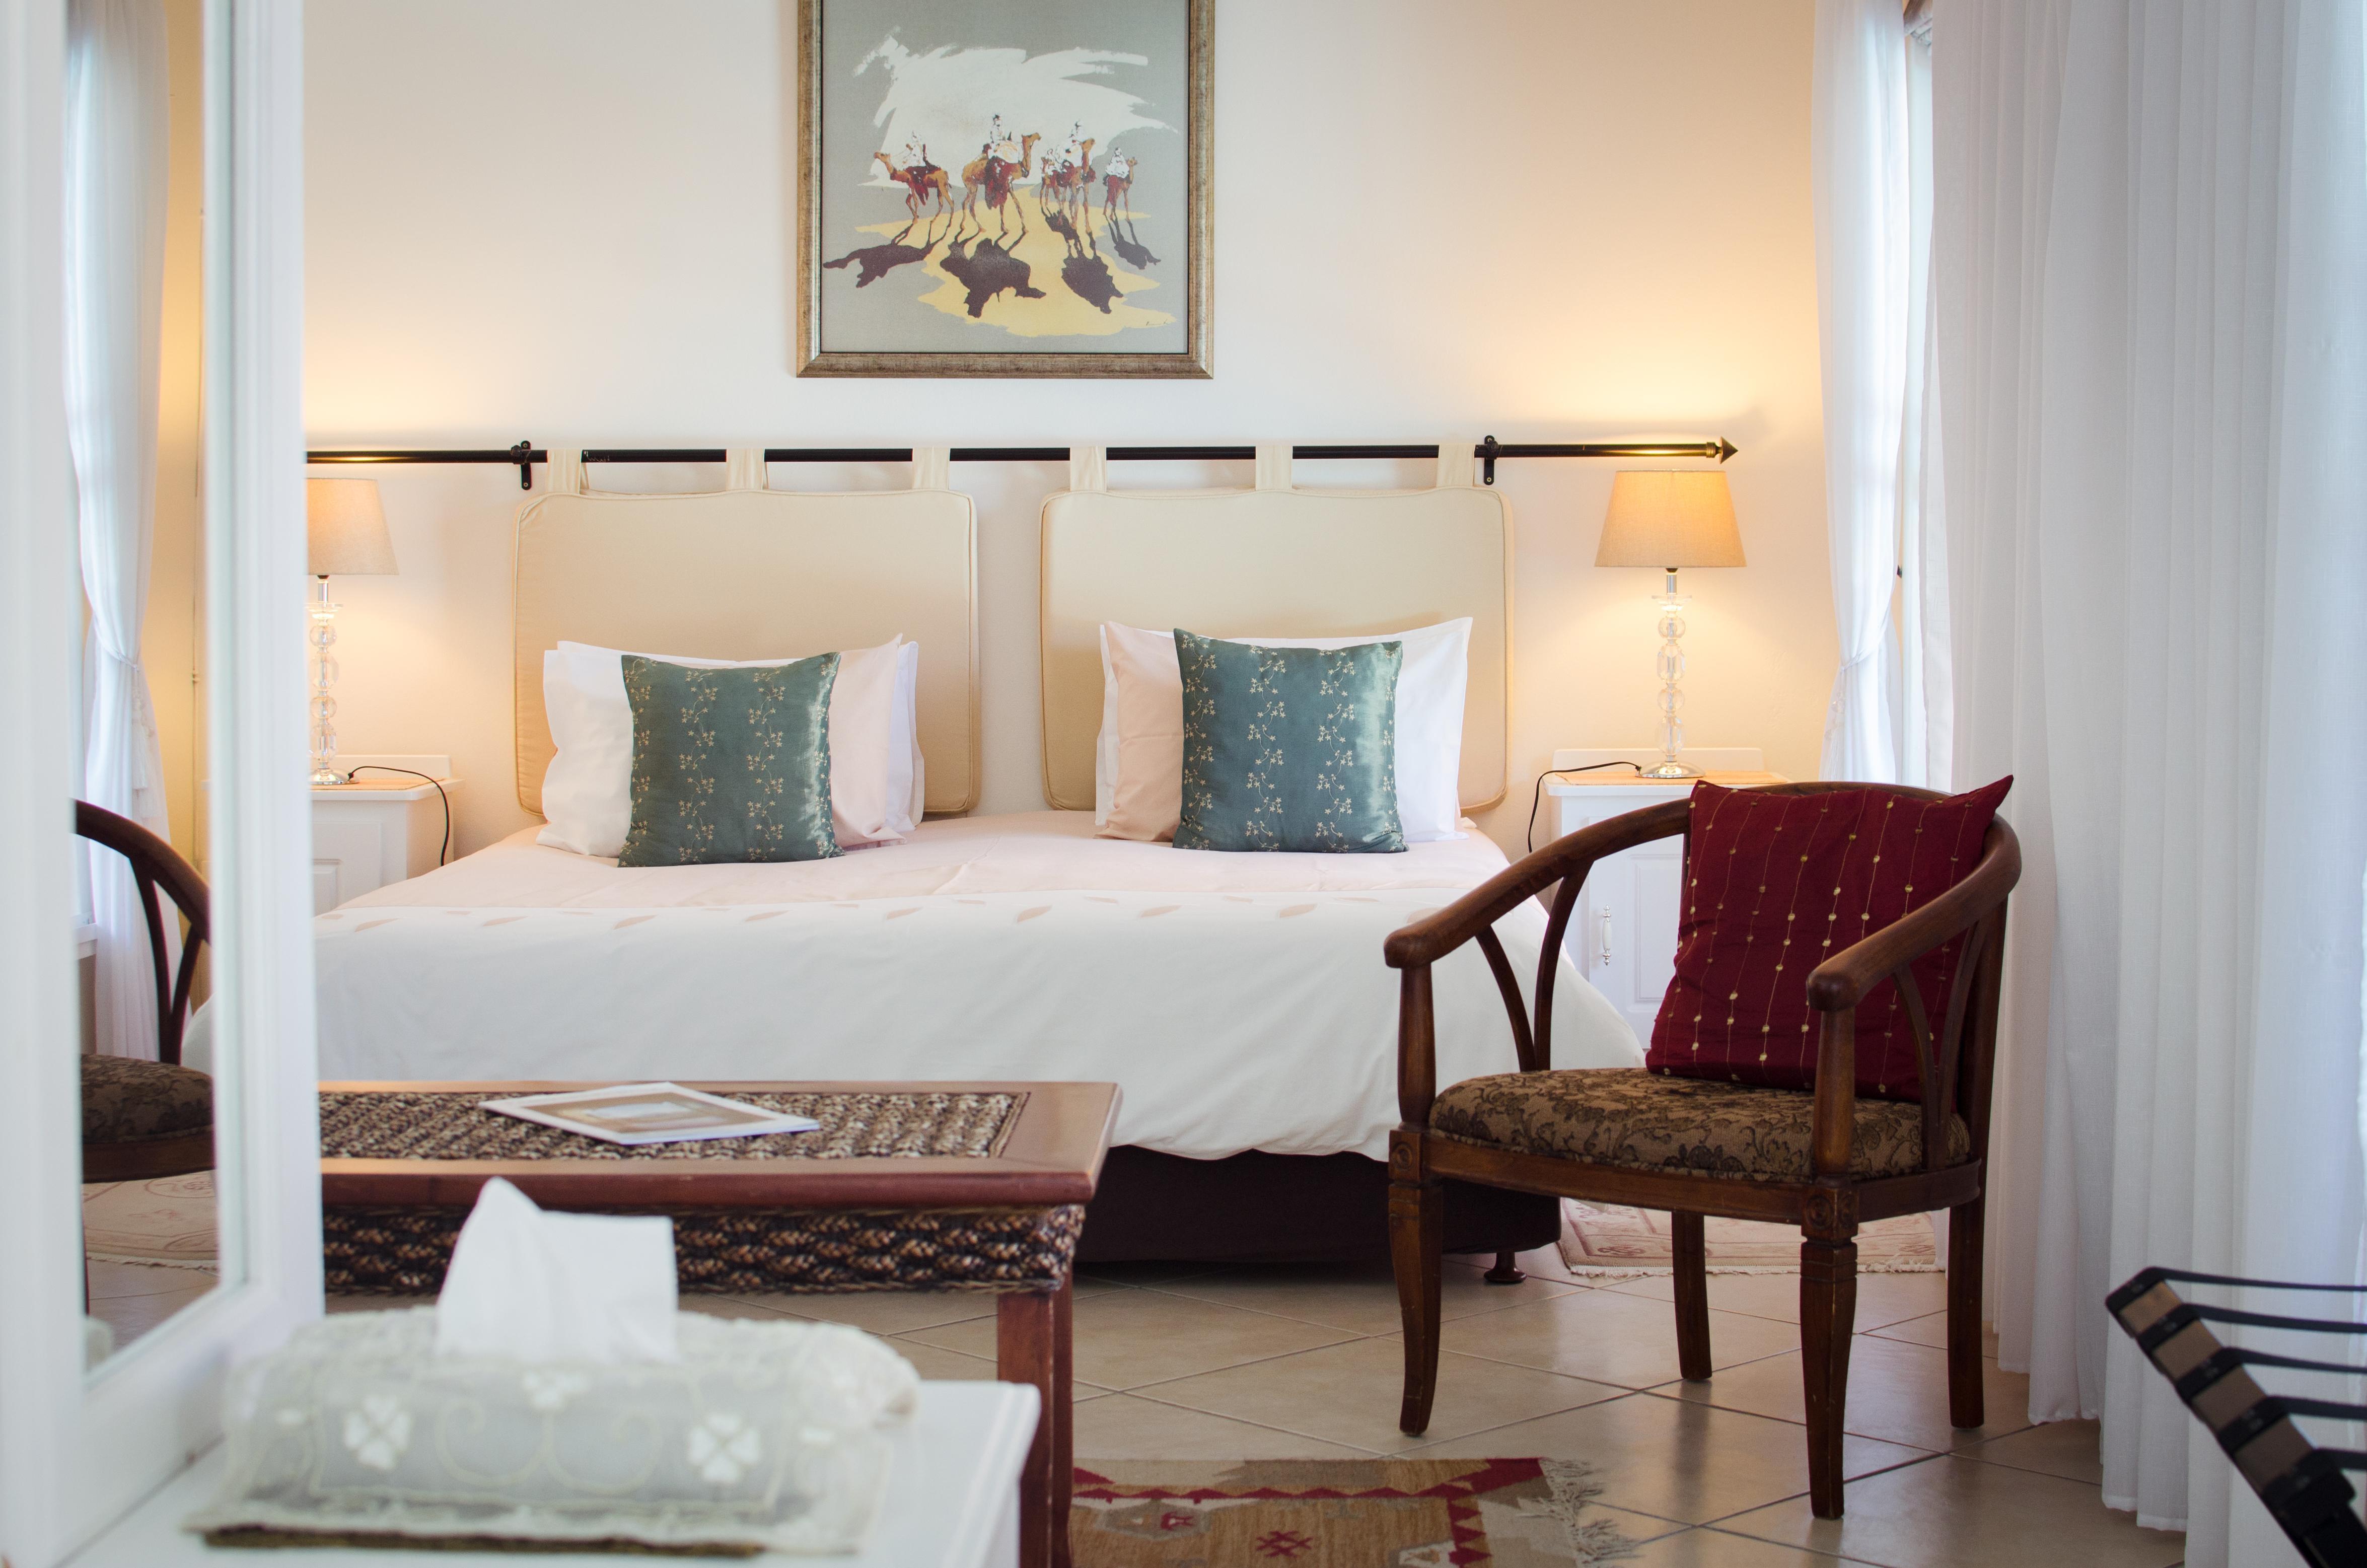 paradiso guesthouse i luxury accommodation in constantia rh paradisobnb co za